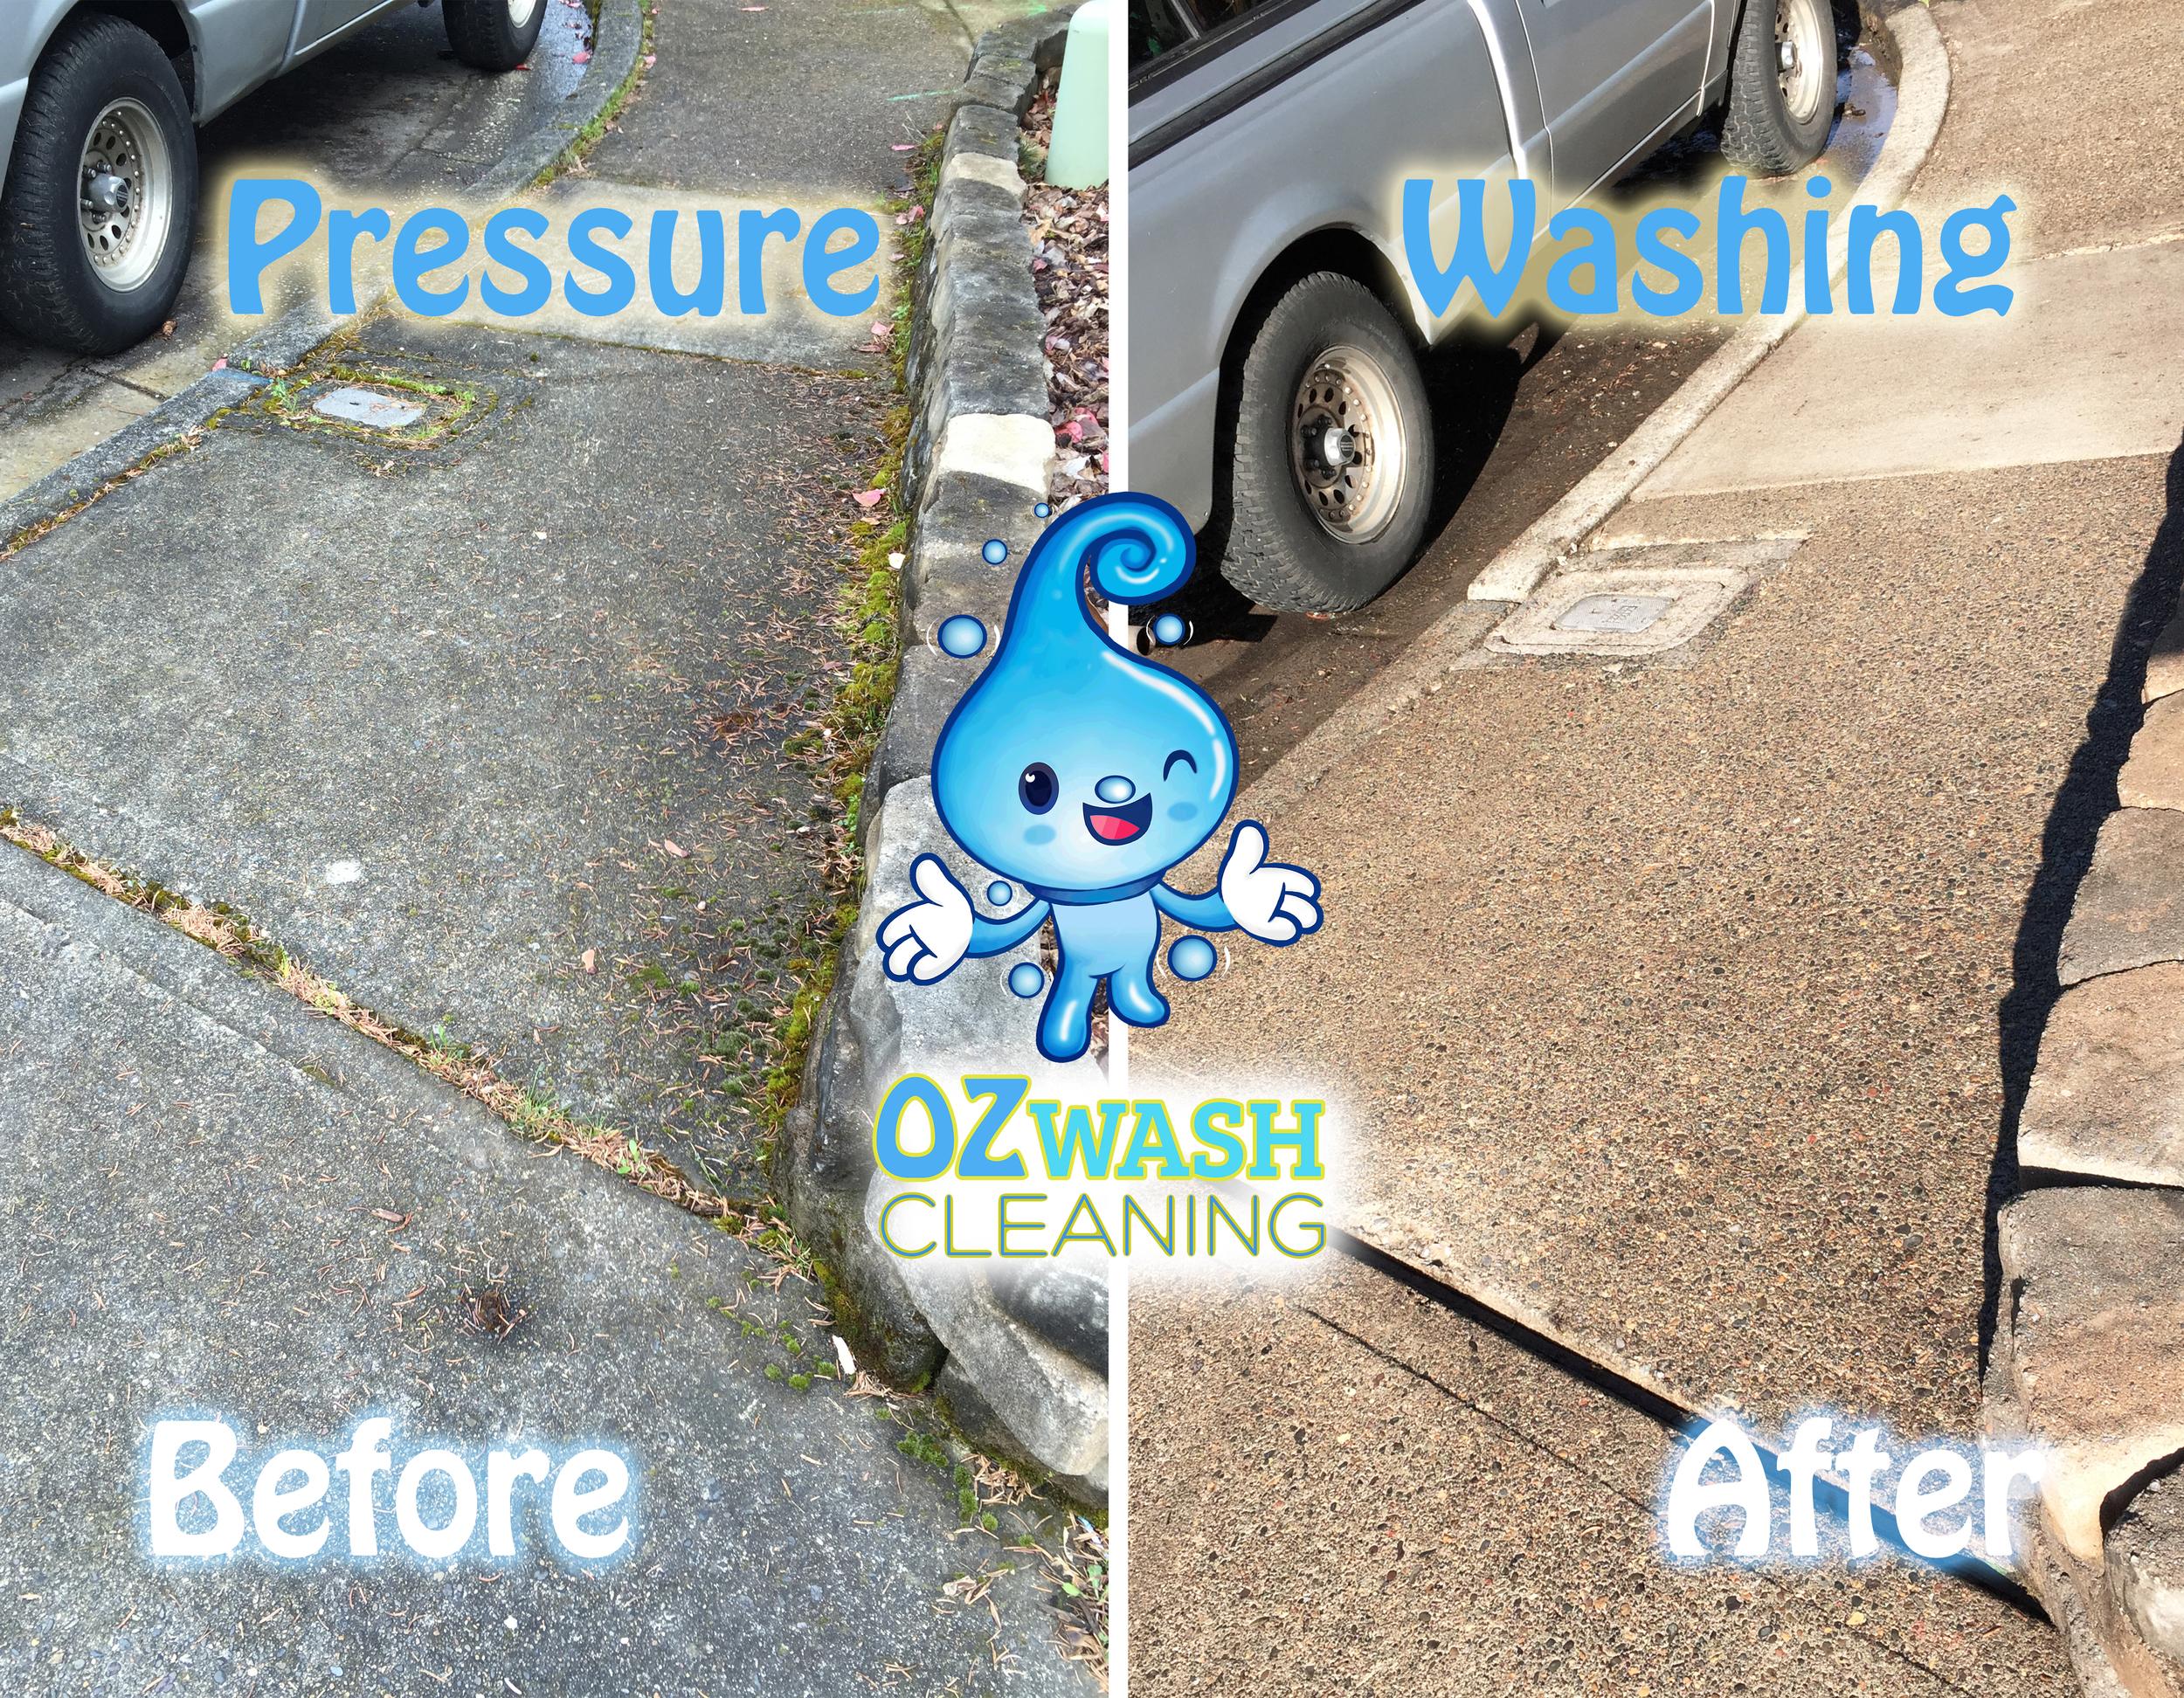 pressurewash15.jpg